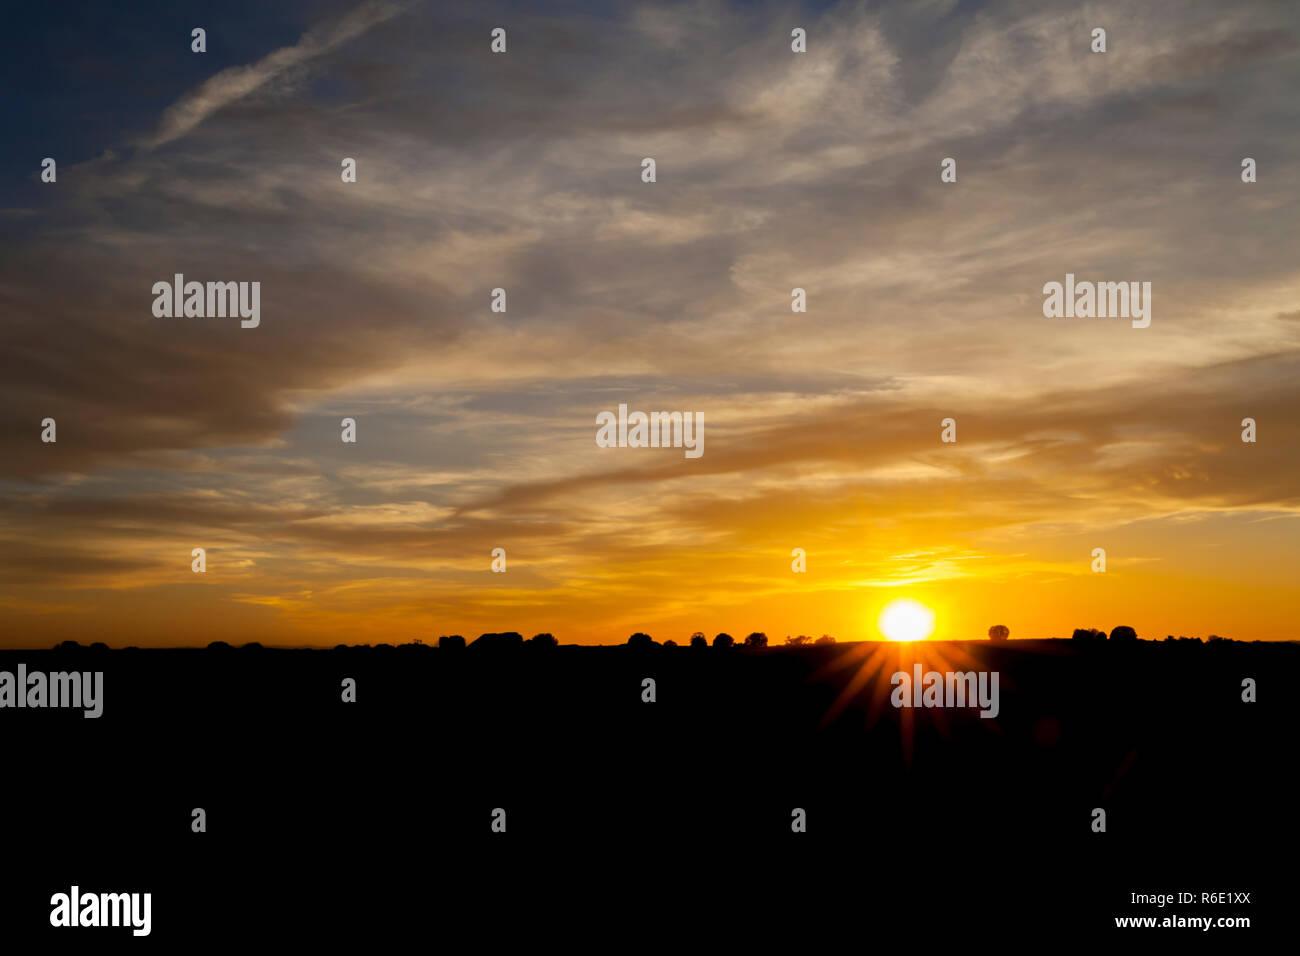 Golden sunset with starburst - Stock Image